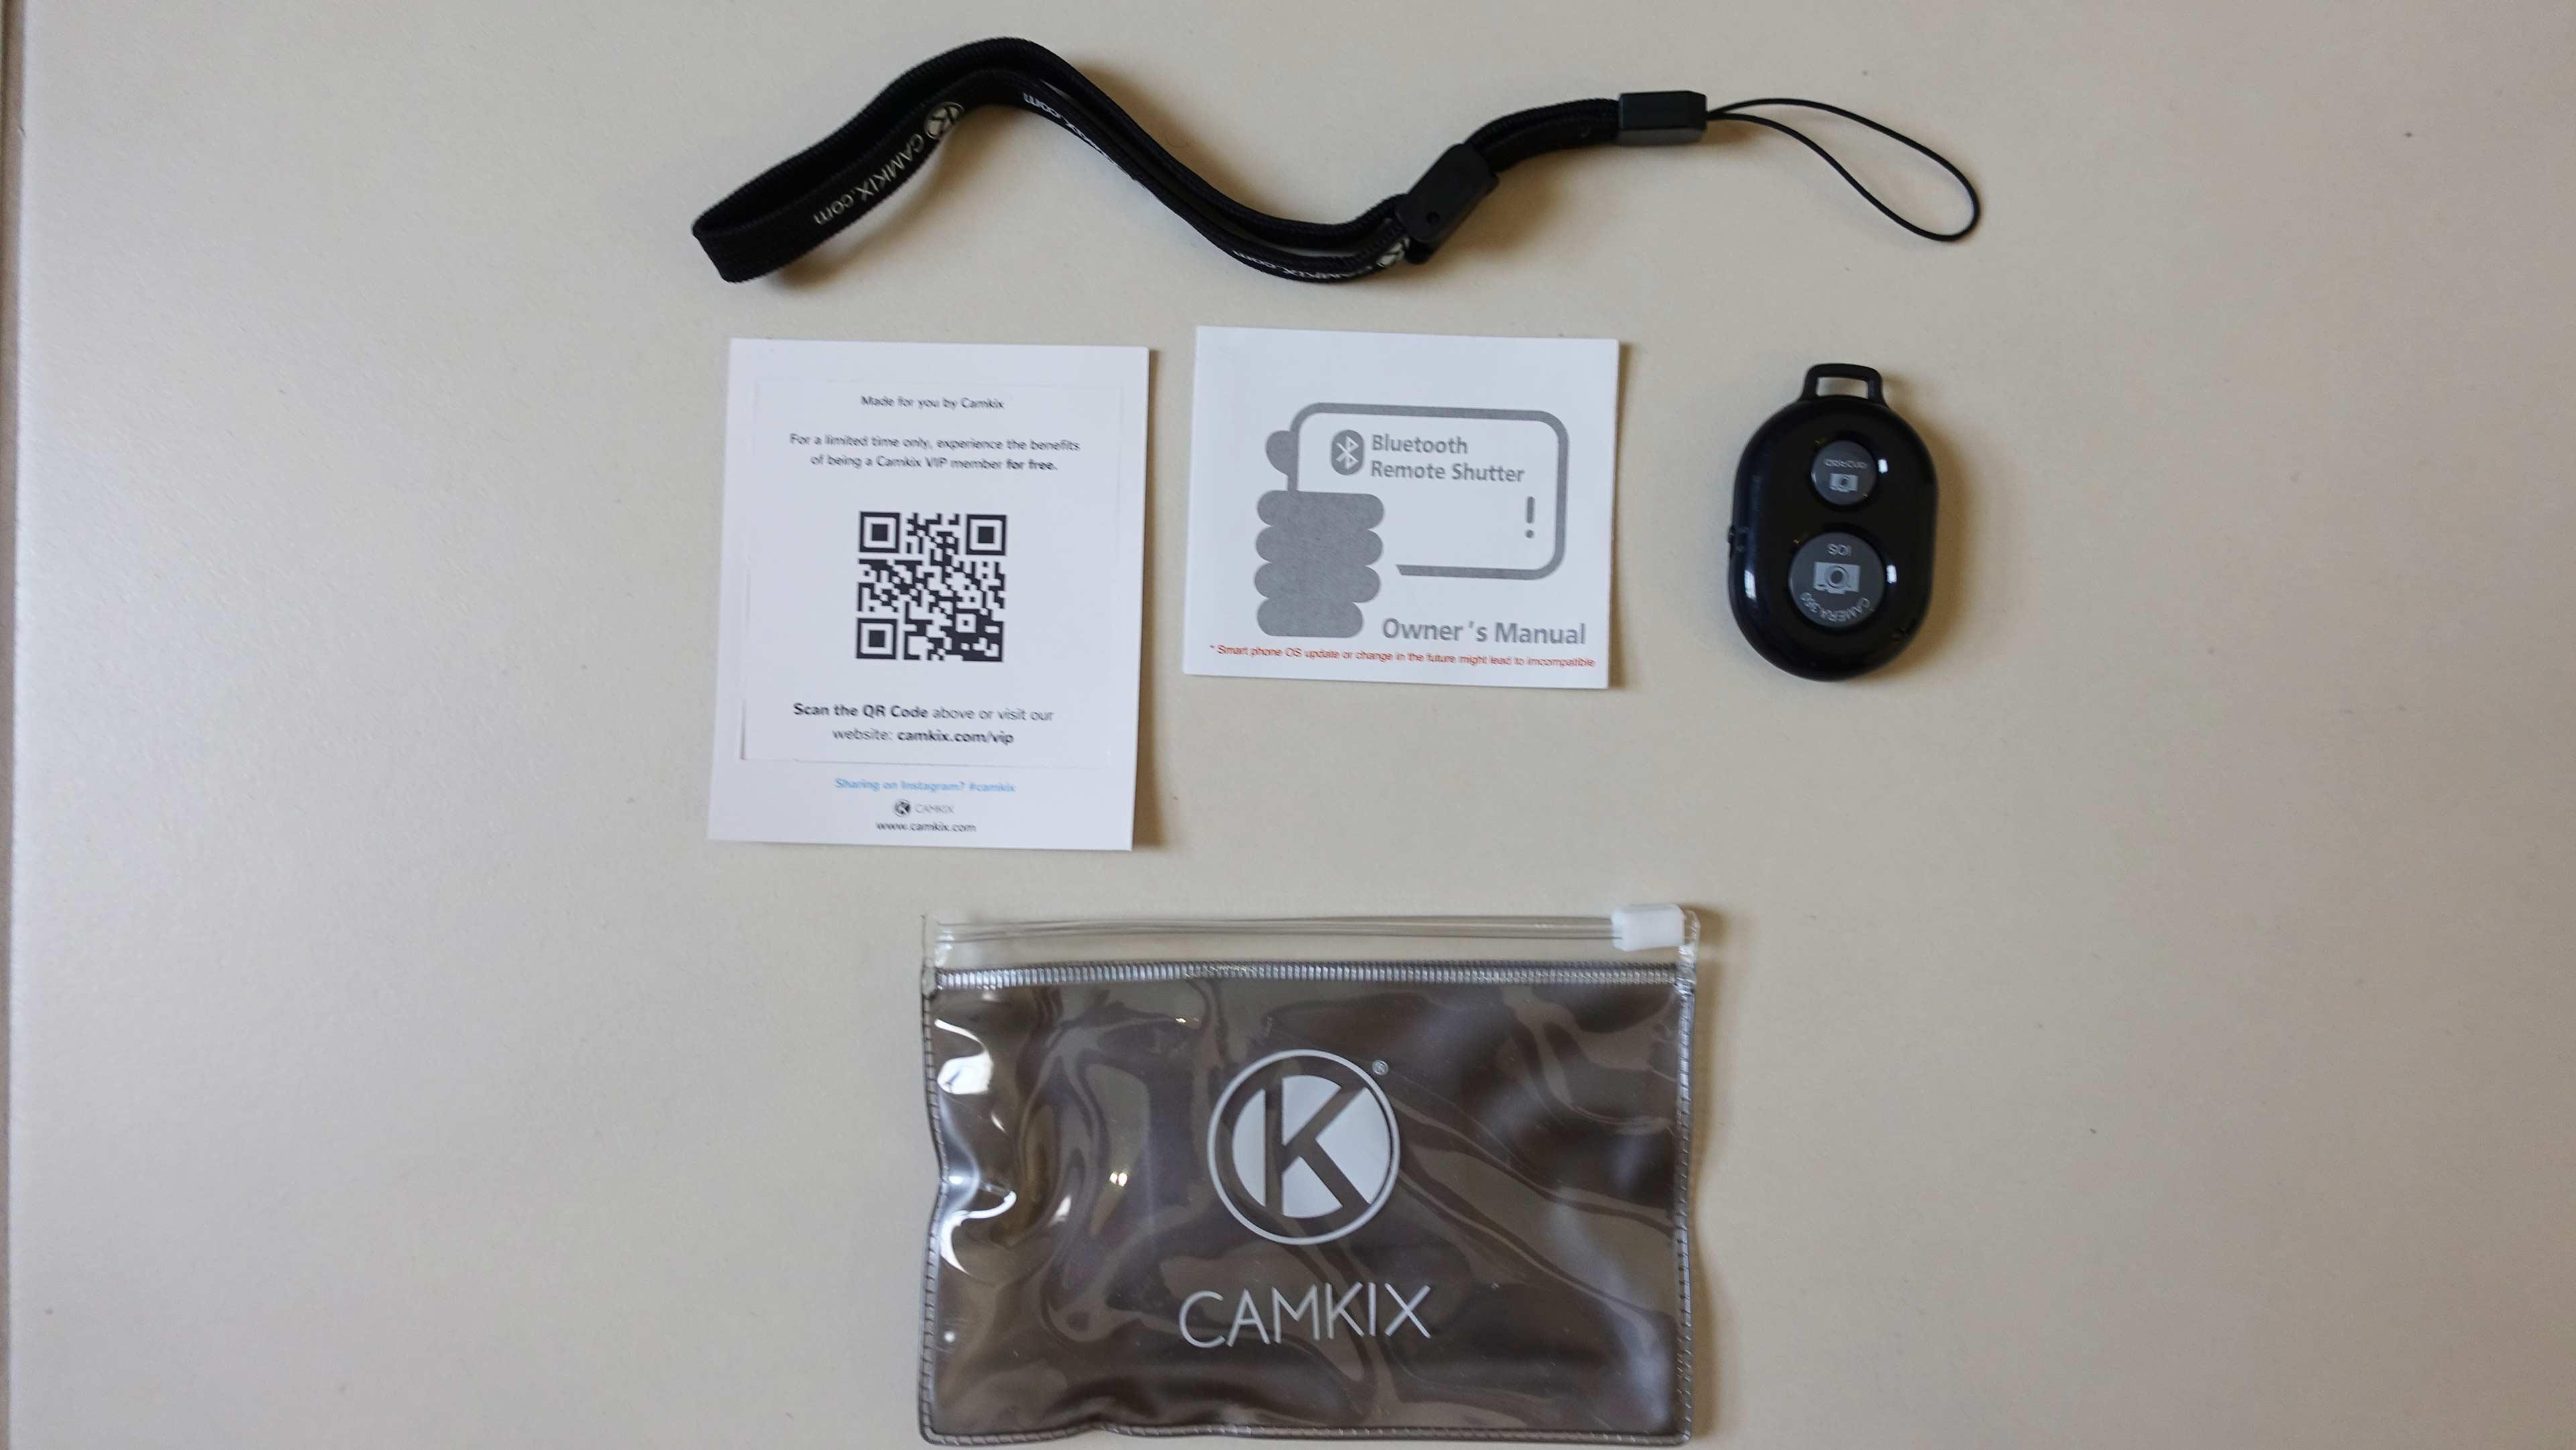 Camkix Bluetooth Shutter Control